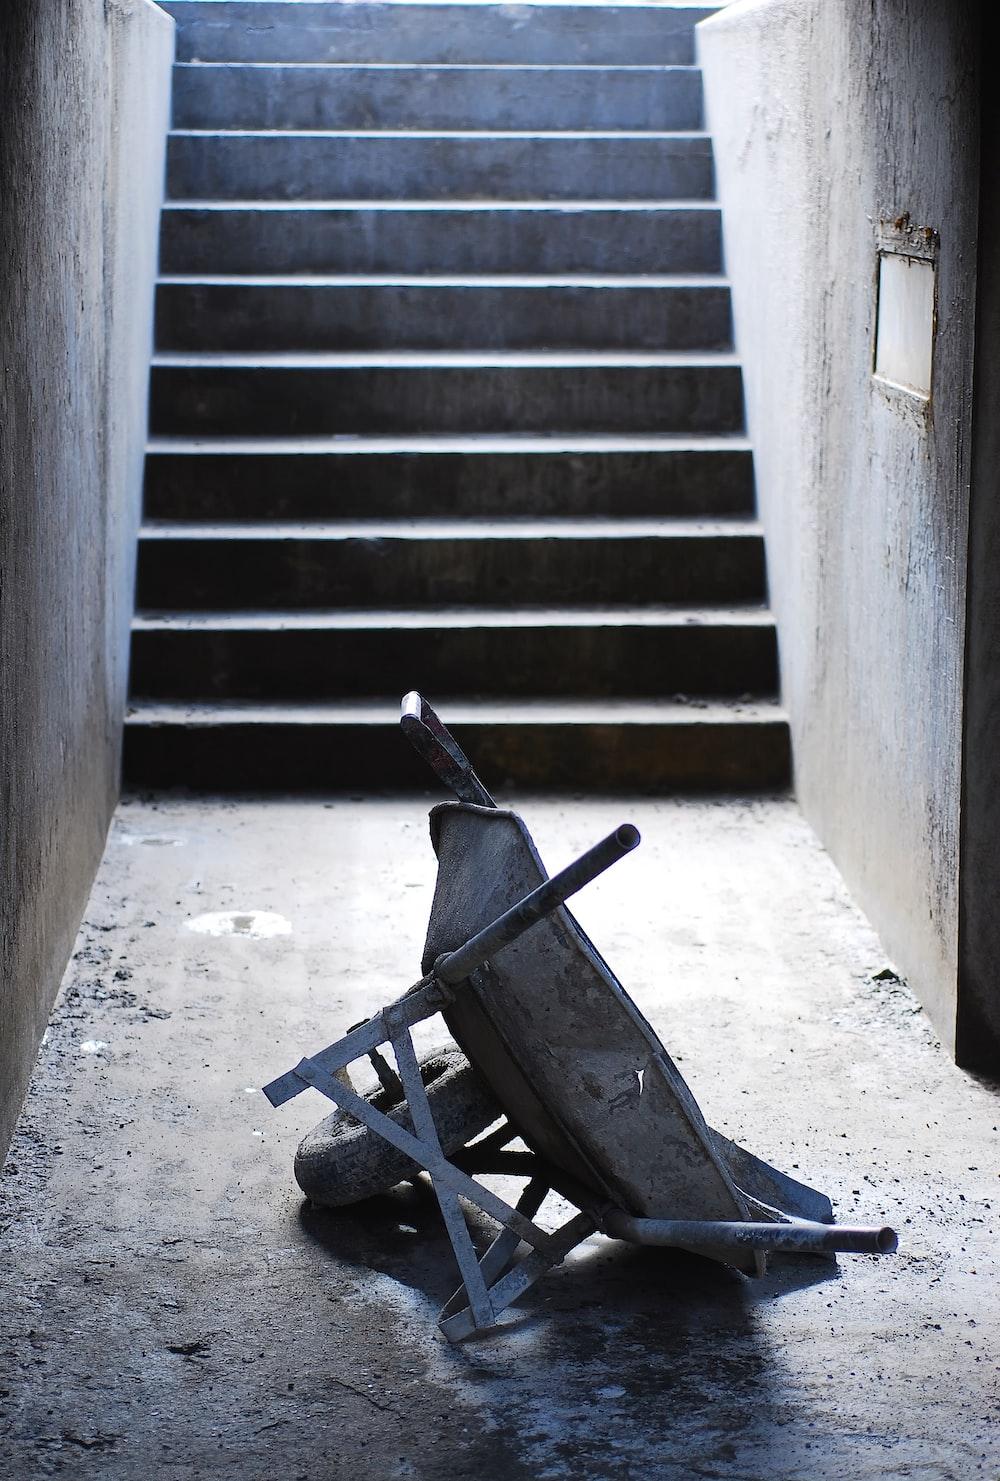 gray wheelbarrow near concrete steps